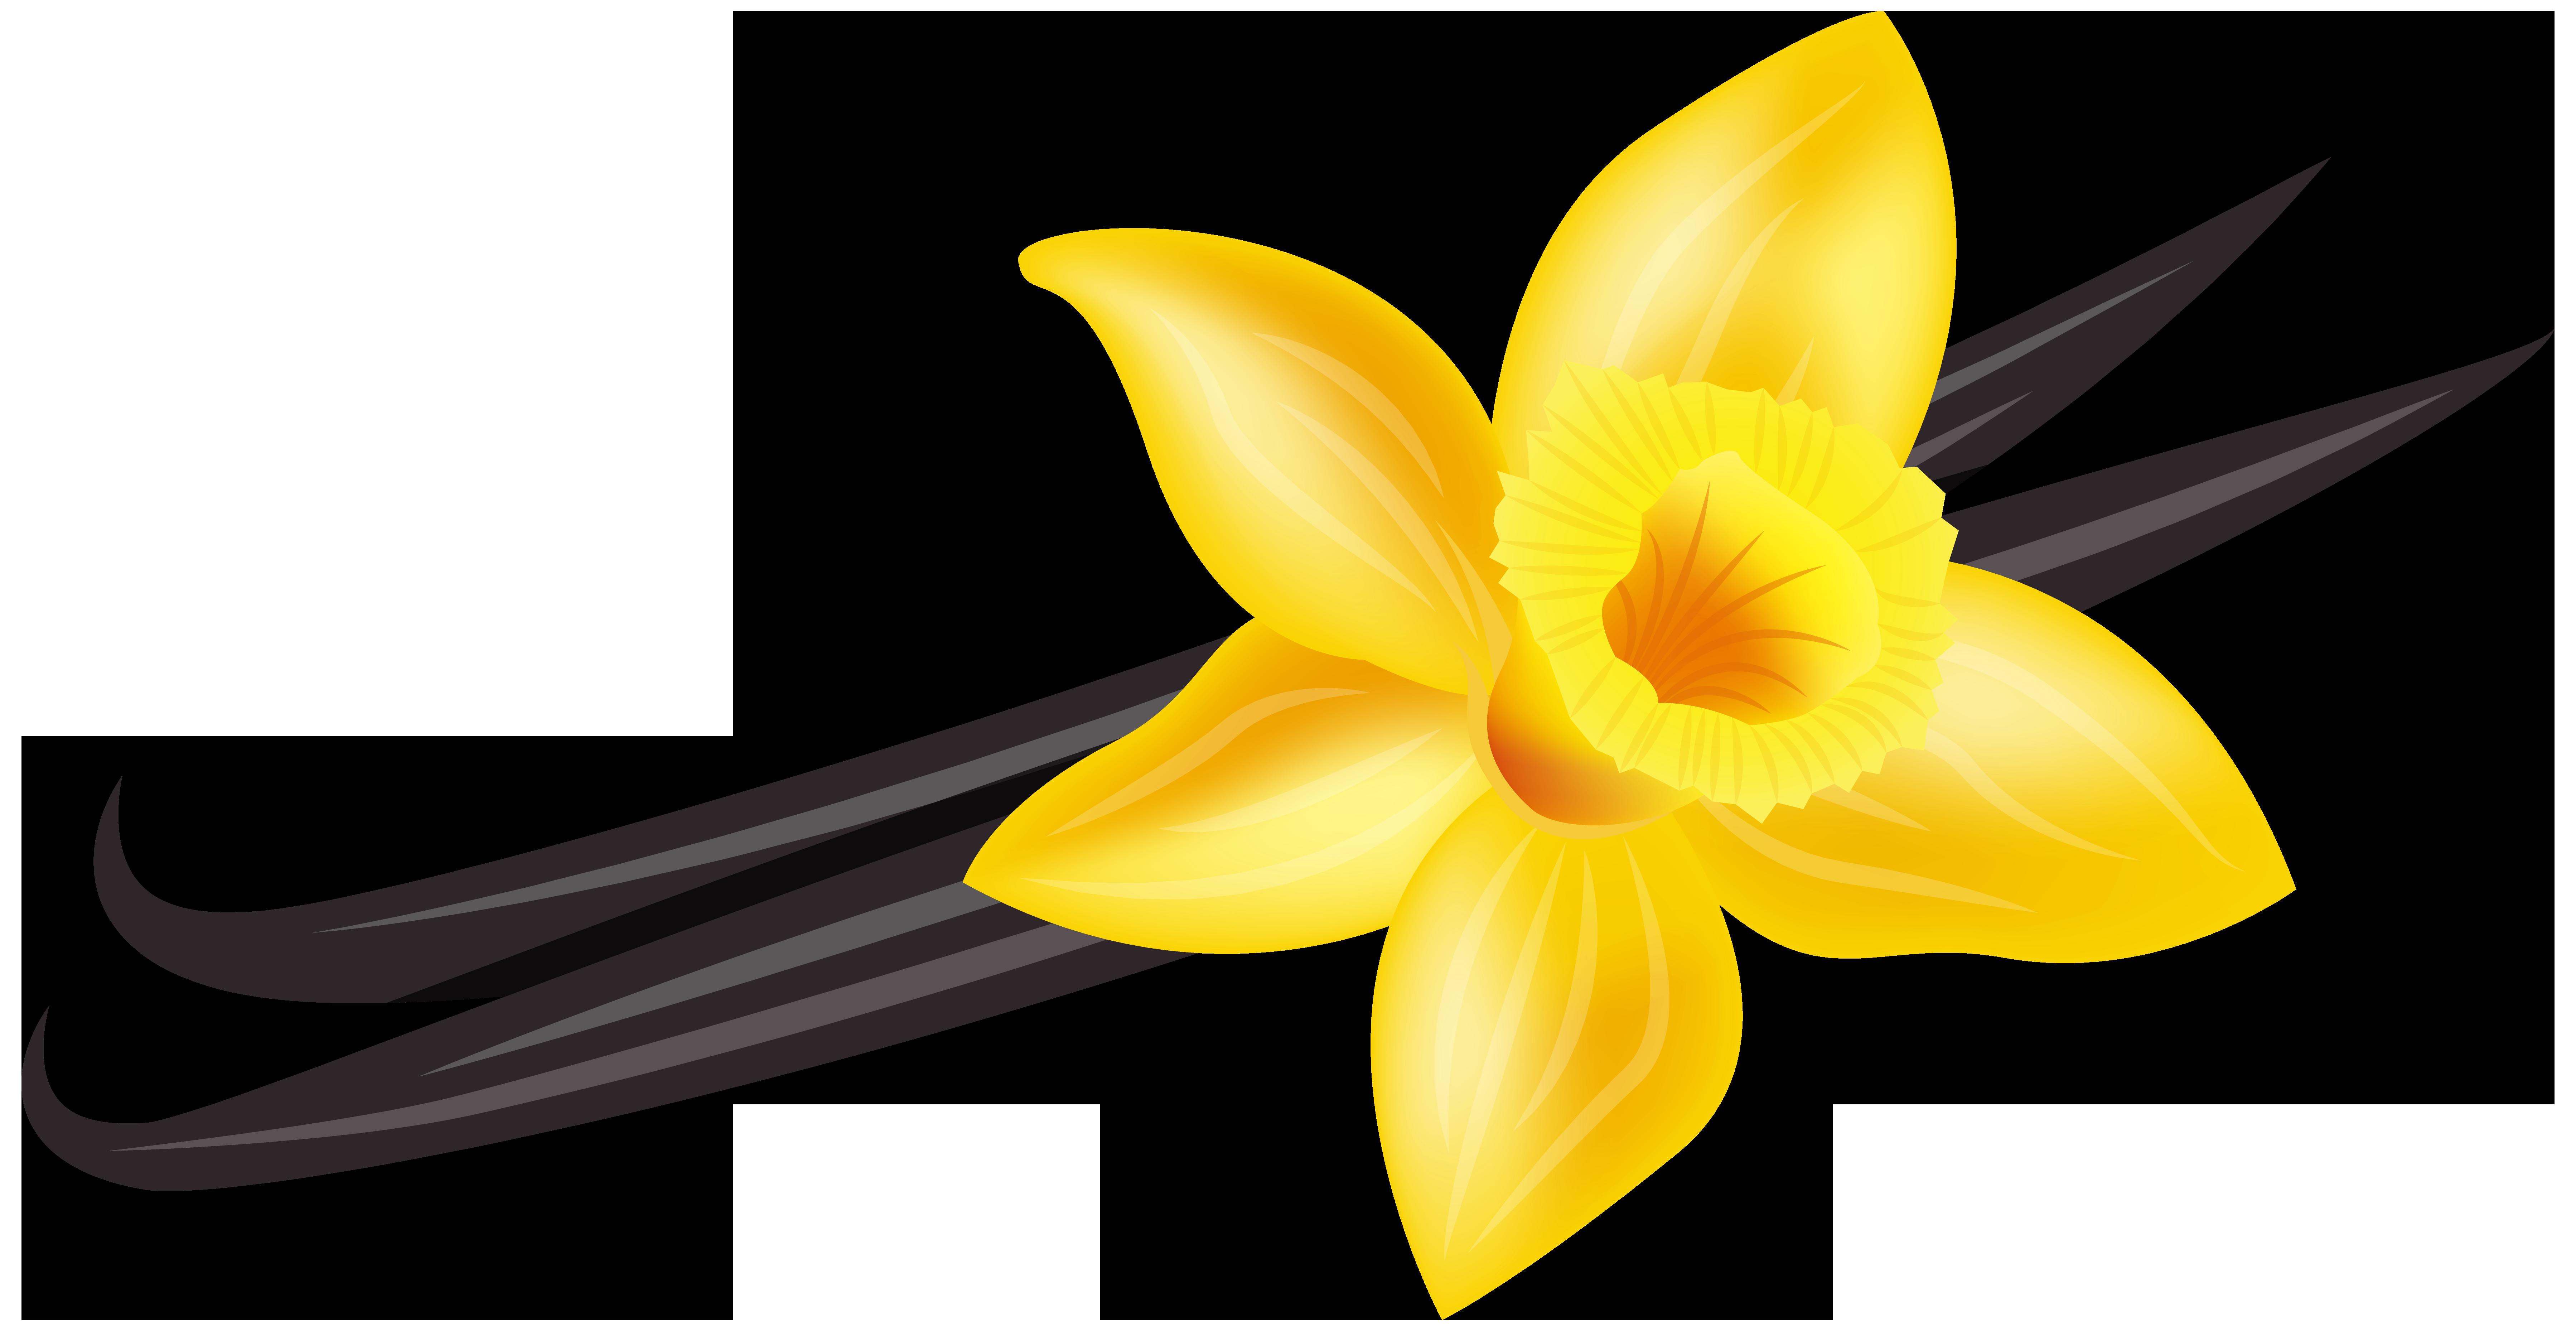 Vanilla flower png. Clip art image gallery